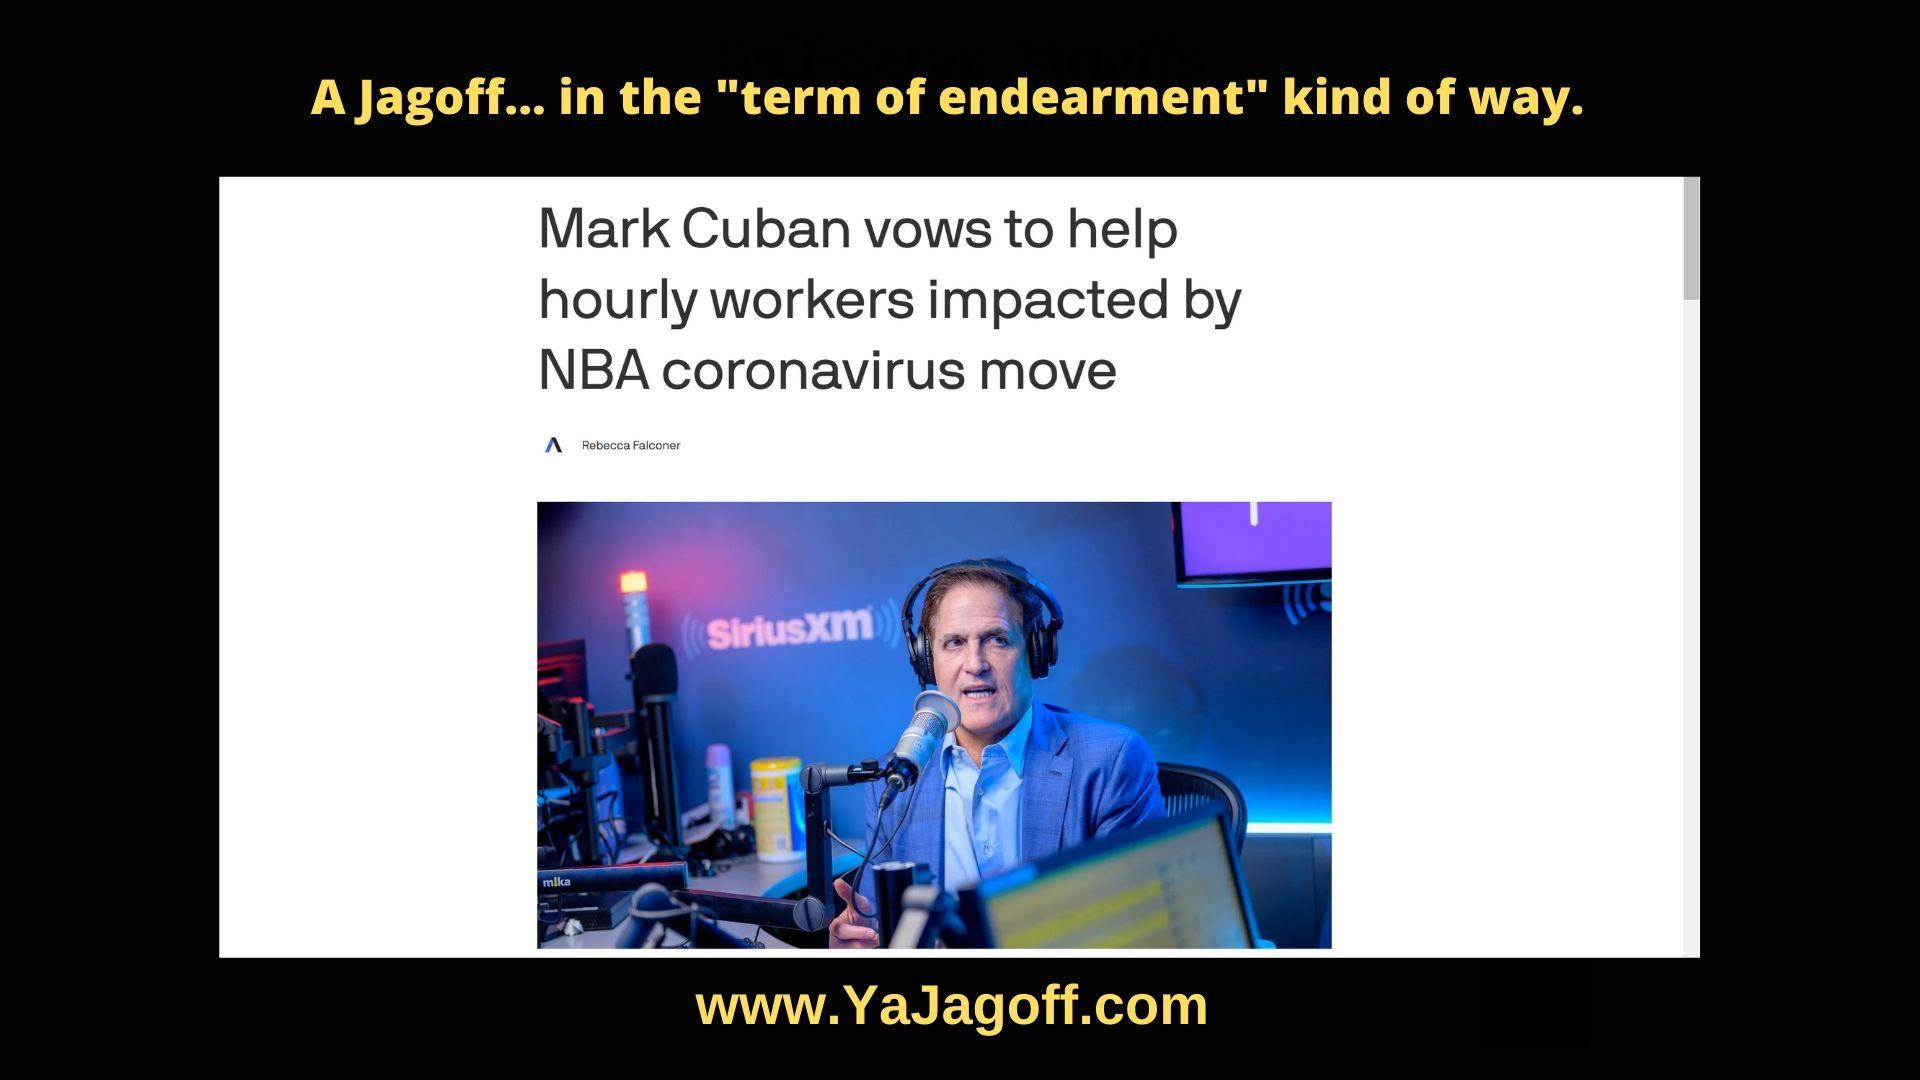 MArk Cuban, Caronavirus